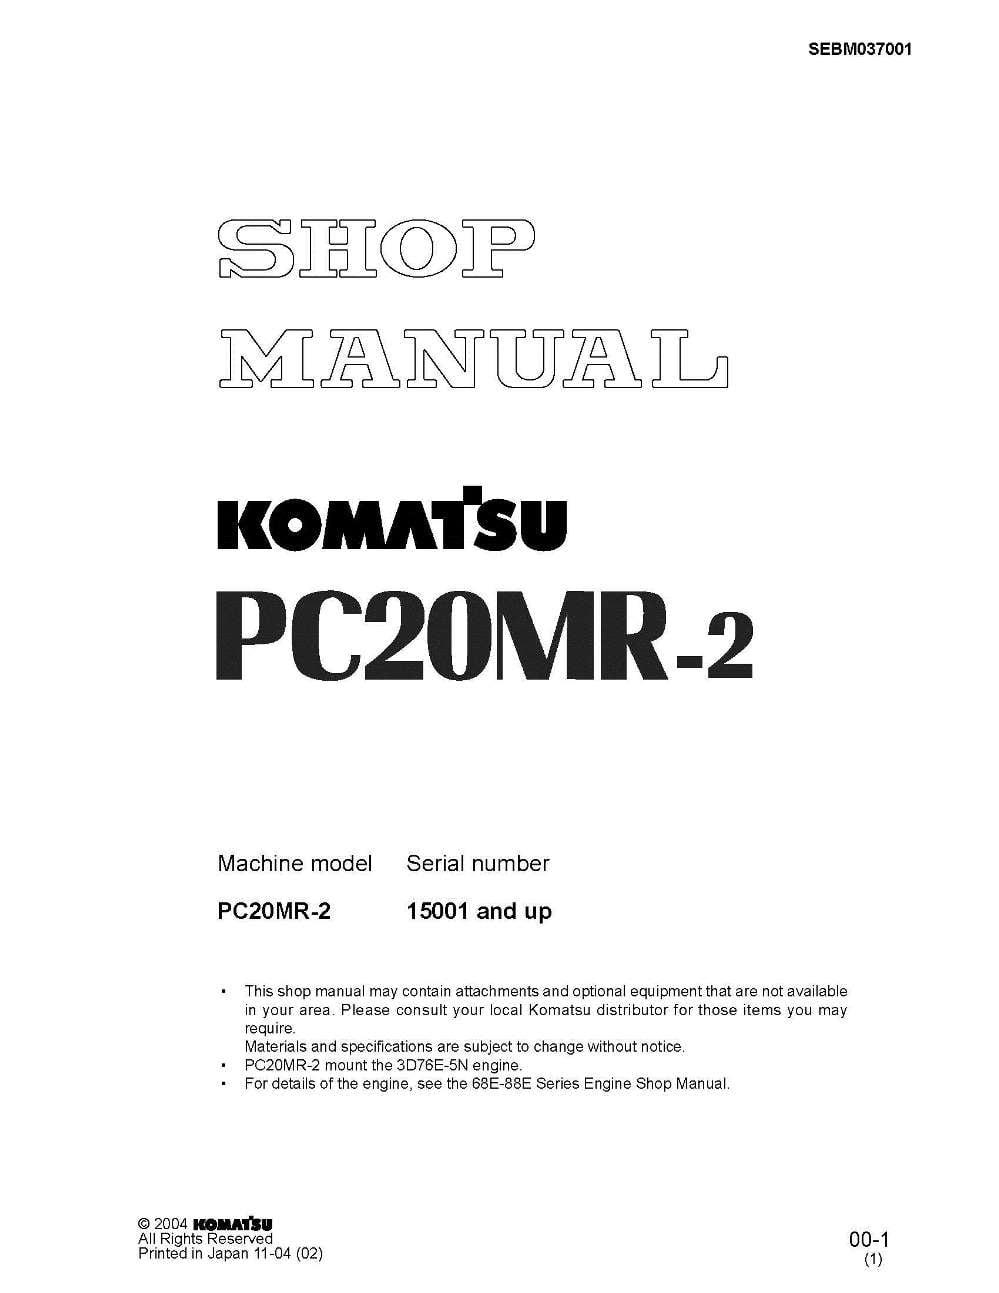 Komatsu Hydraulic Excavator Pc20mr 2 Workshop Repair Service Manual Pc75uu 1 Wiring Diagram Serial Numbers 15001 And Up Pdf Download